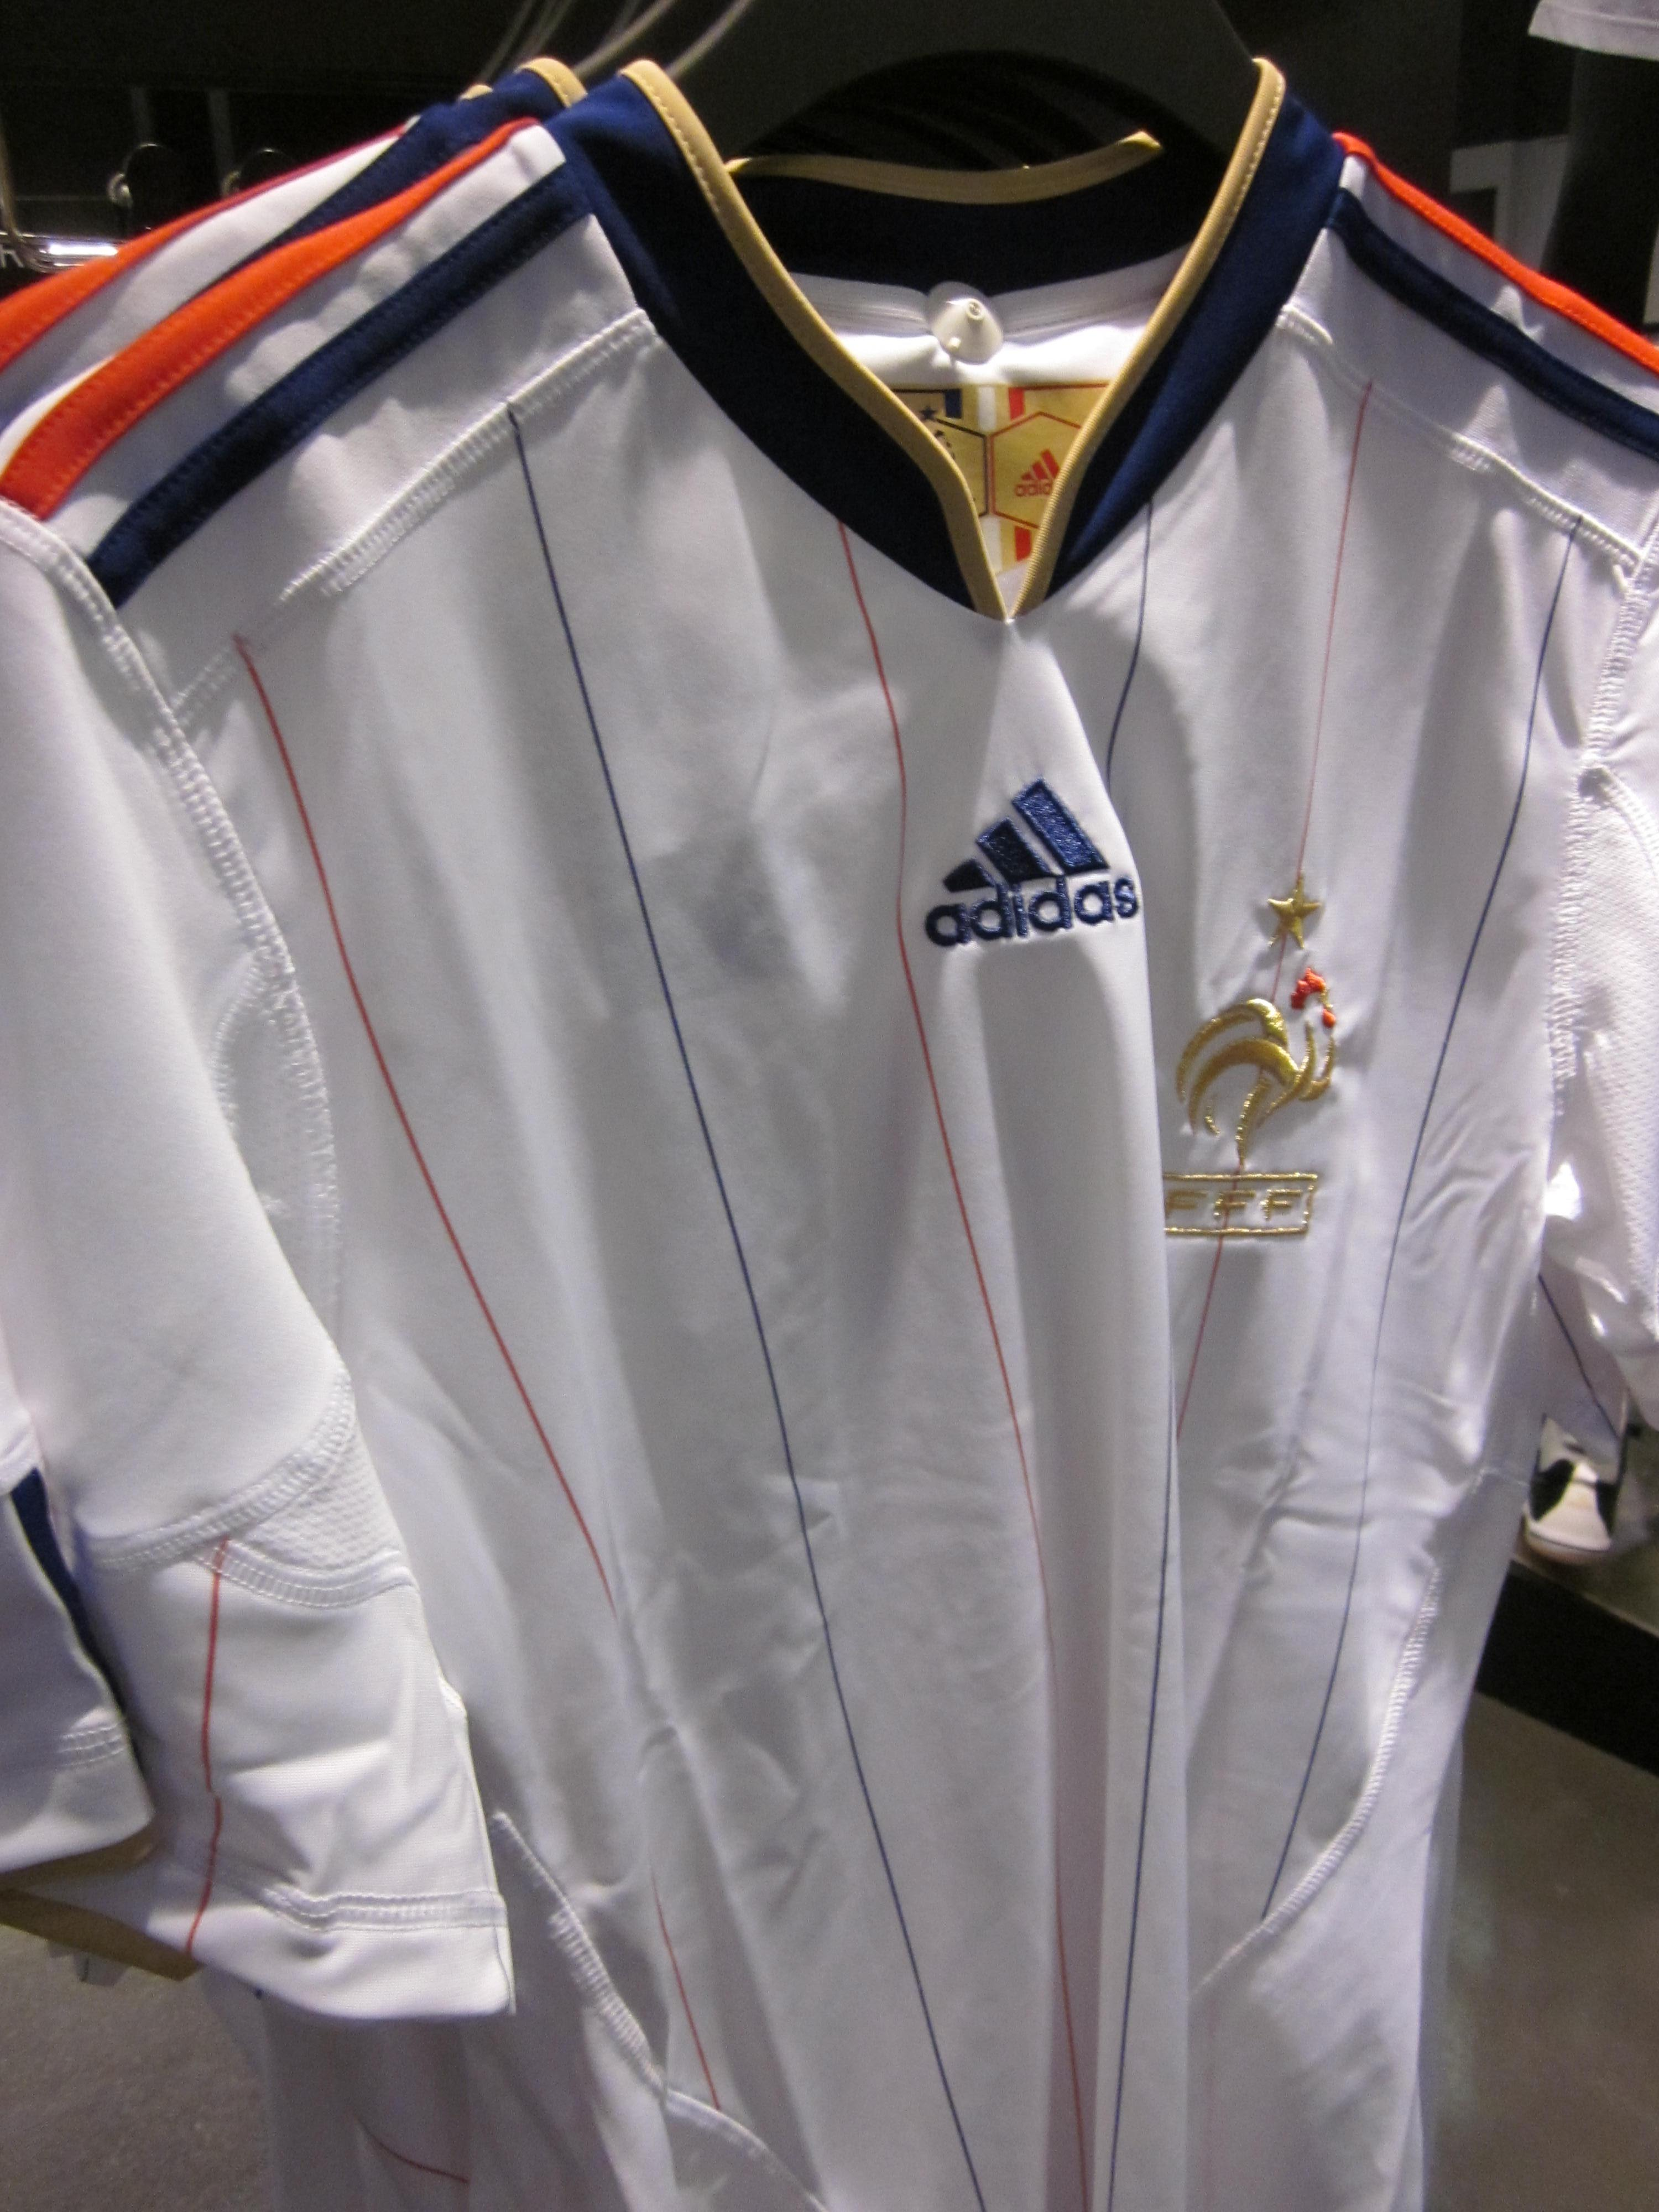 File:Adidas France national football team away jersey.JPG ...